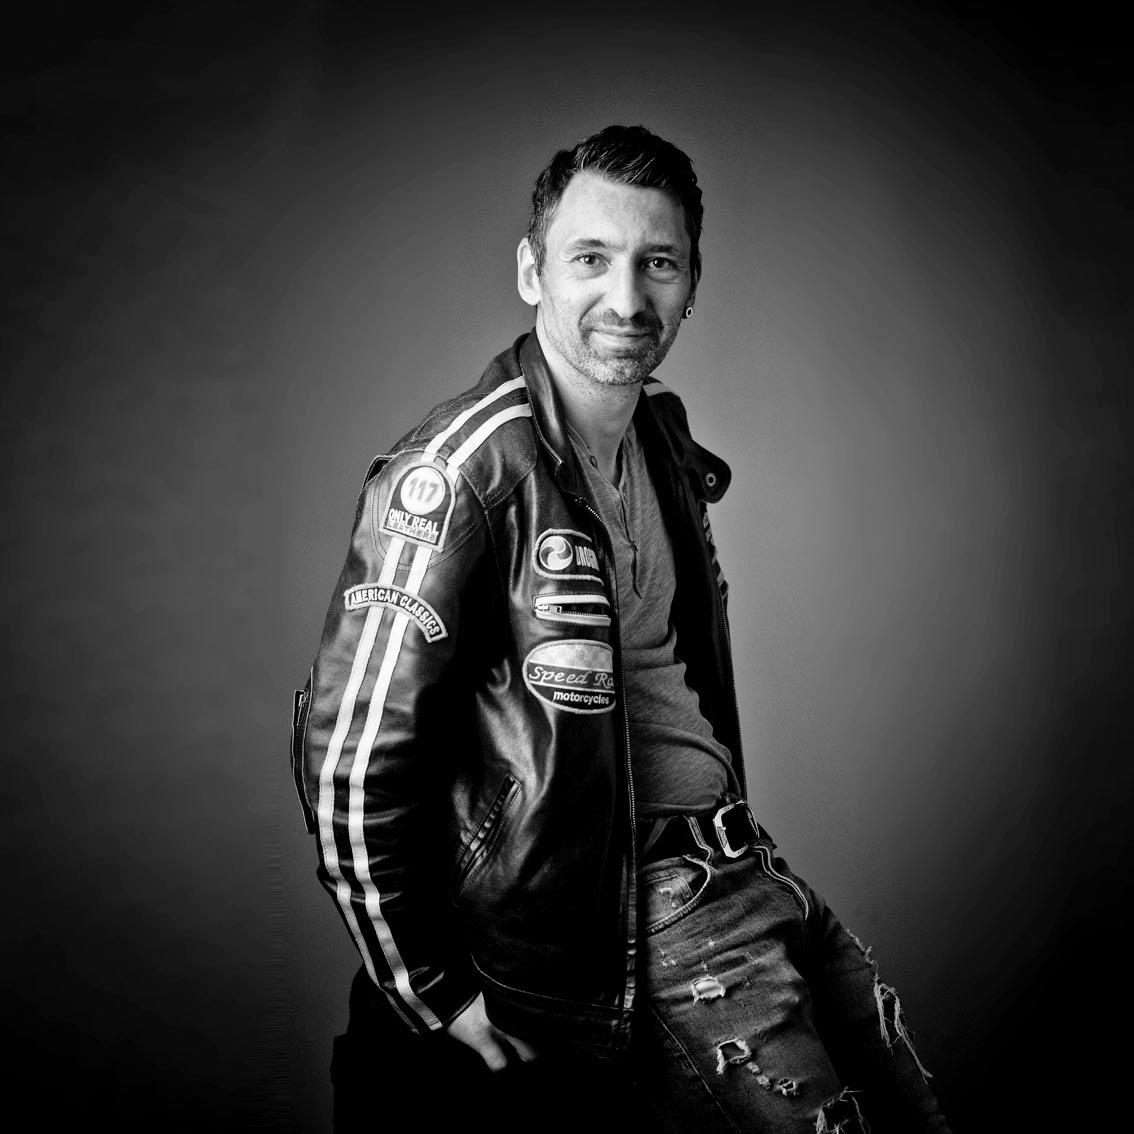 Portrait Mann, black&white Fotografie